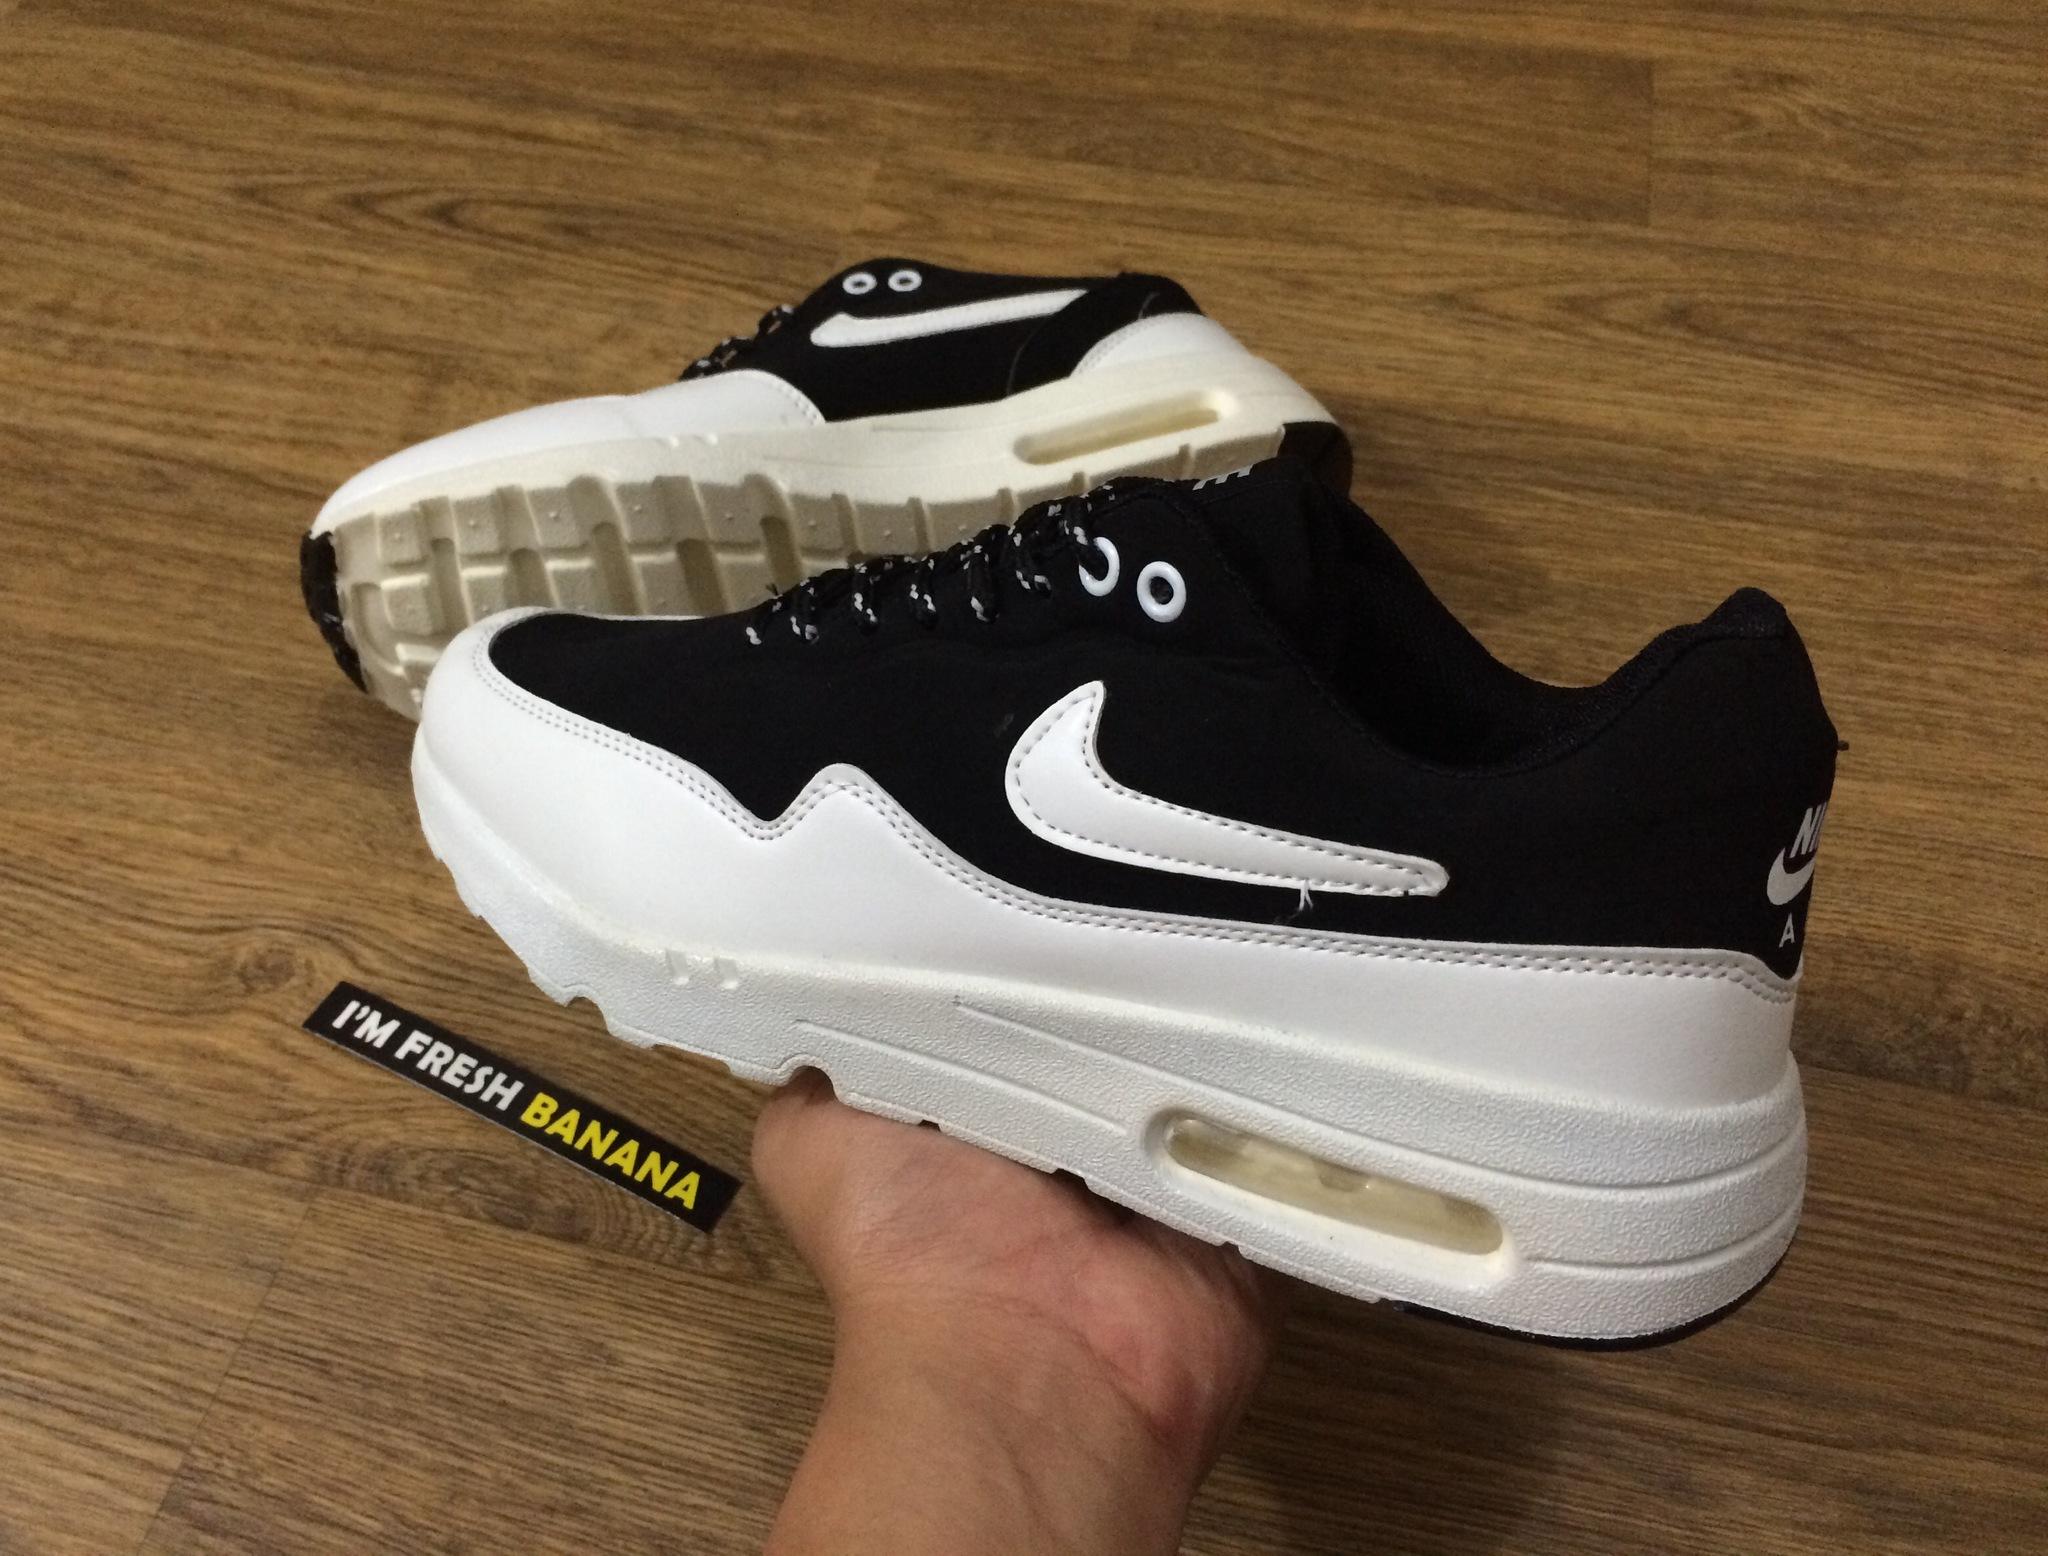 uk availability 28e2e 5aebe ... authentic jual sepatu nike airmax one 1 ultra moire white black fresh  banana tokopedia 12328 3a8a8